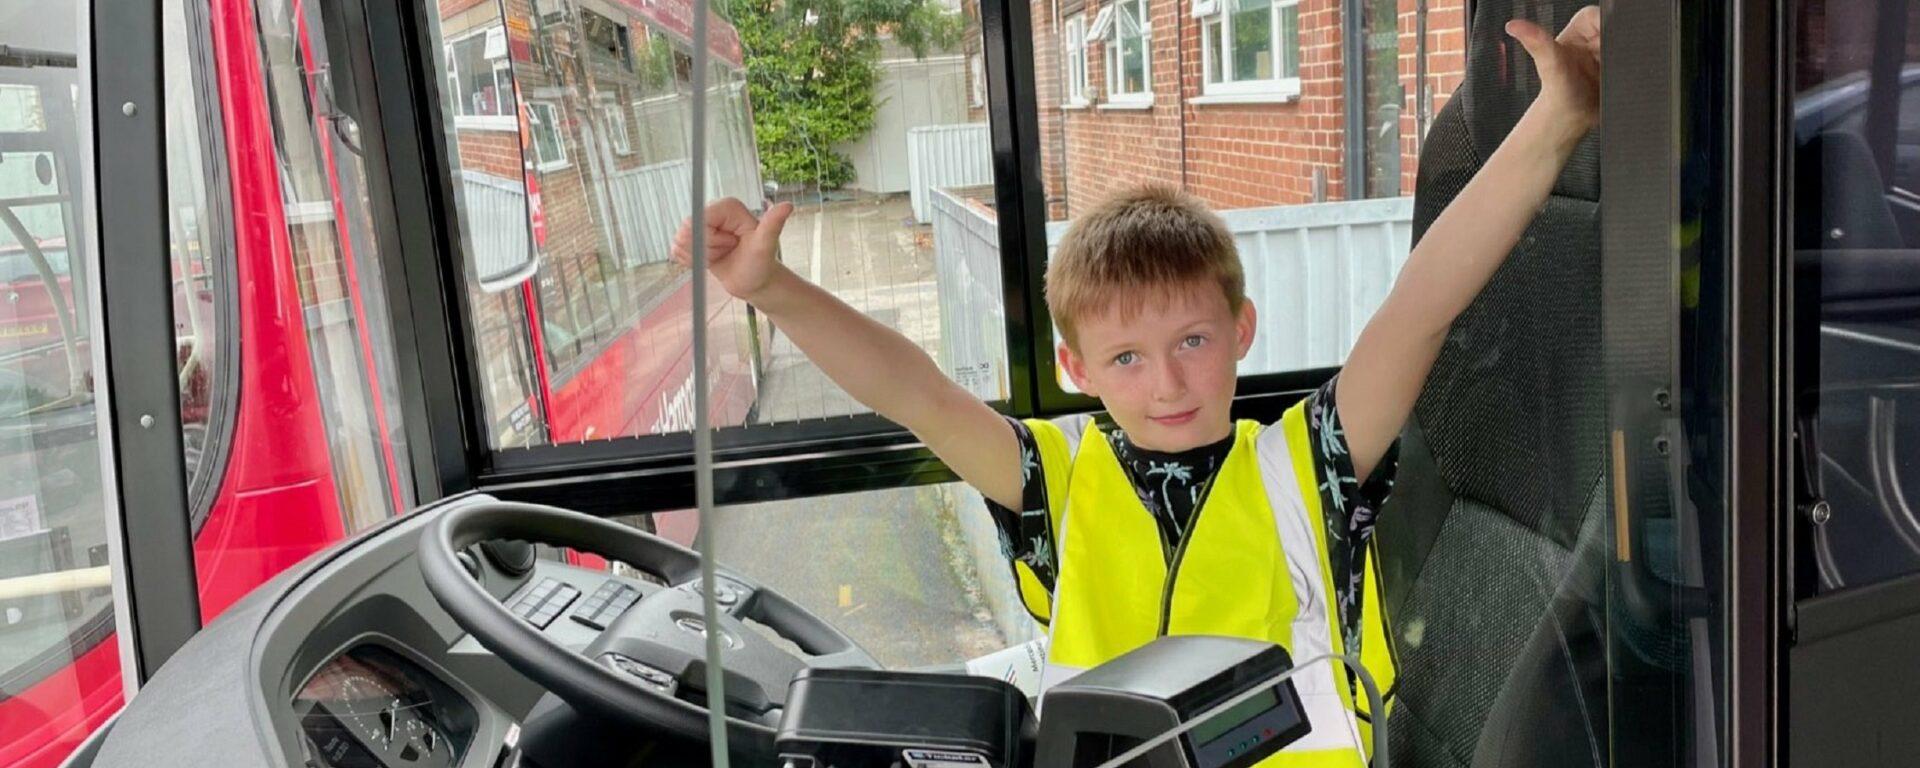 meet-eight-year-old-seeger-crawly-transdev-uks-bus-super-fan